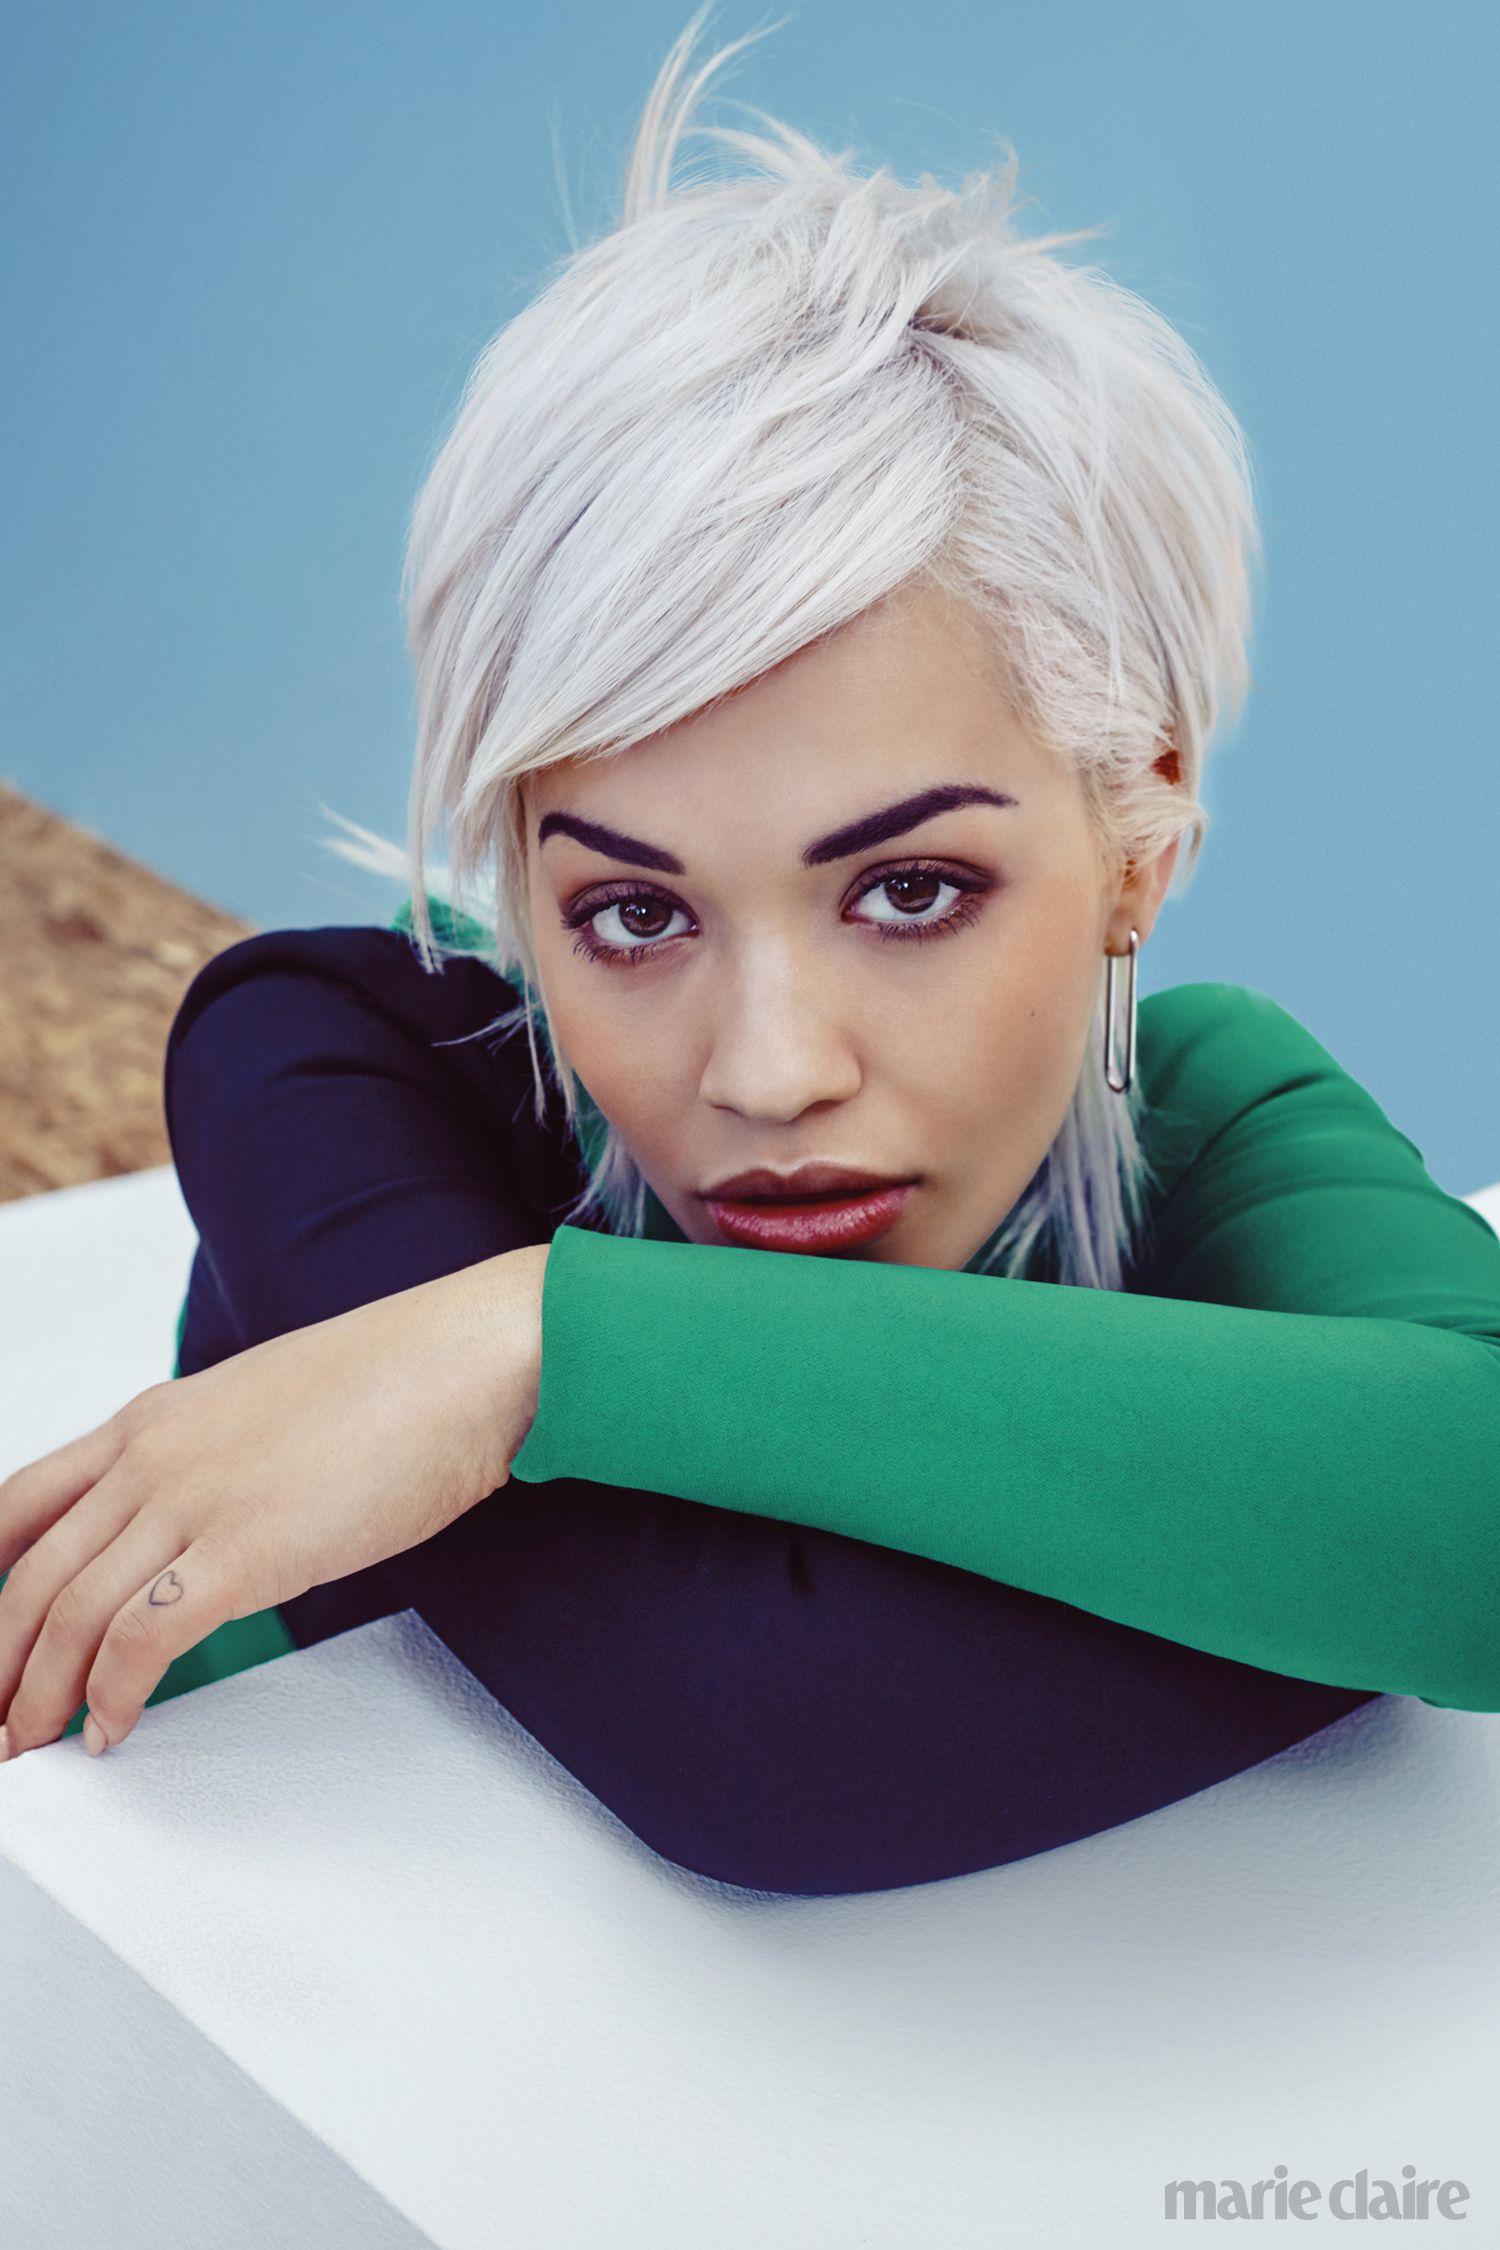 July Cover Star Rita Ora Gets Real